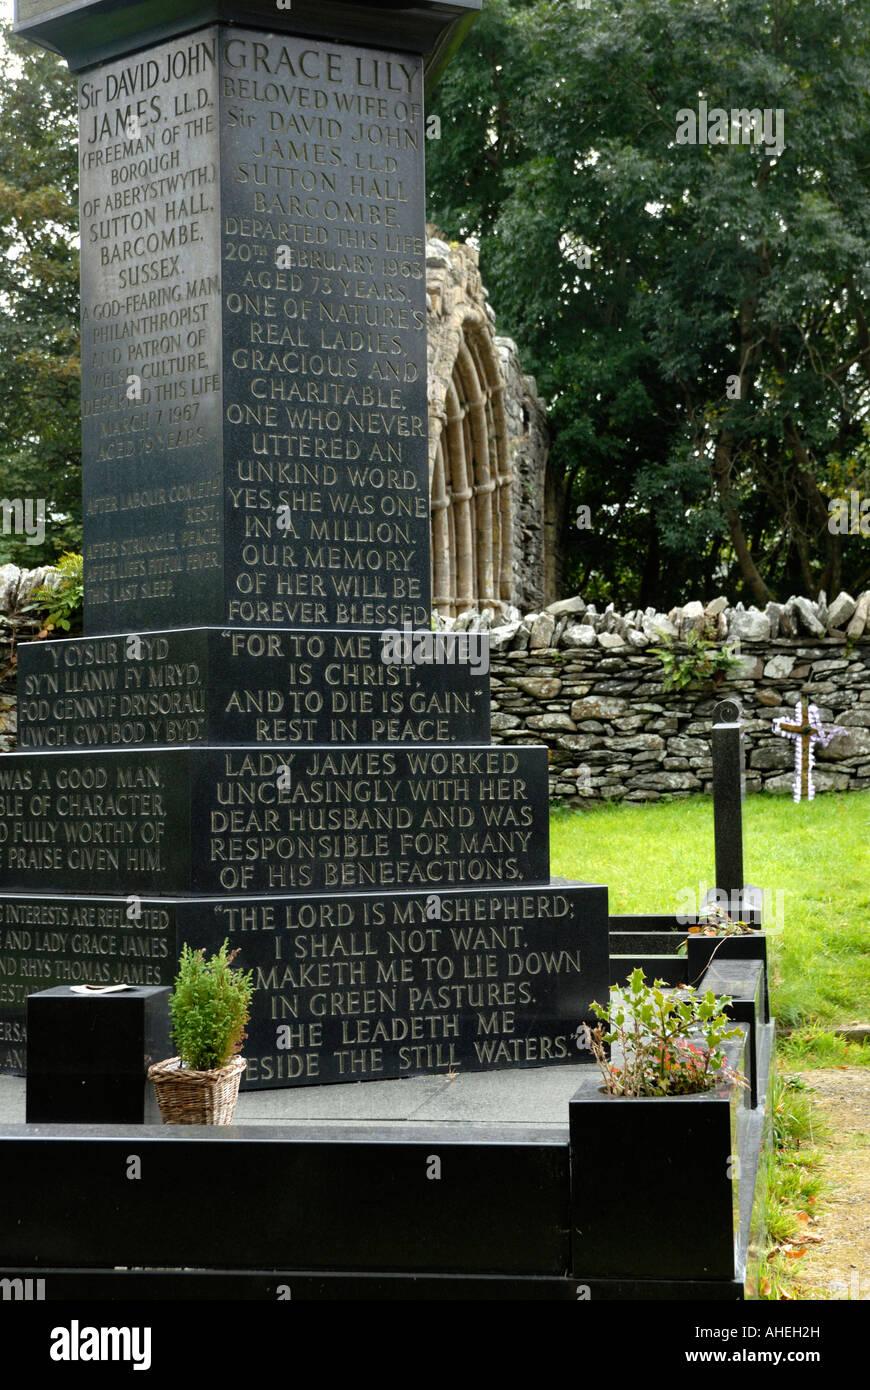 Norweigian black marble monument at Strata Florida chapel, Ceredigion, Wales. - Stock Image